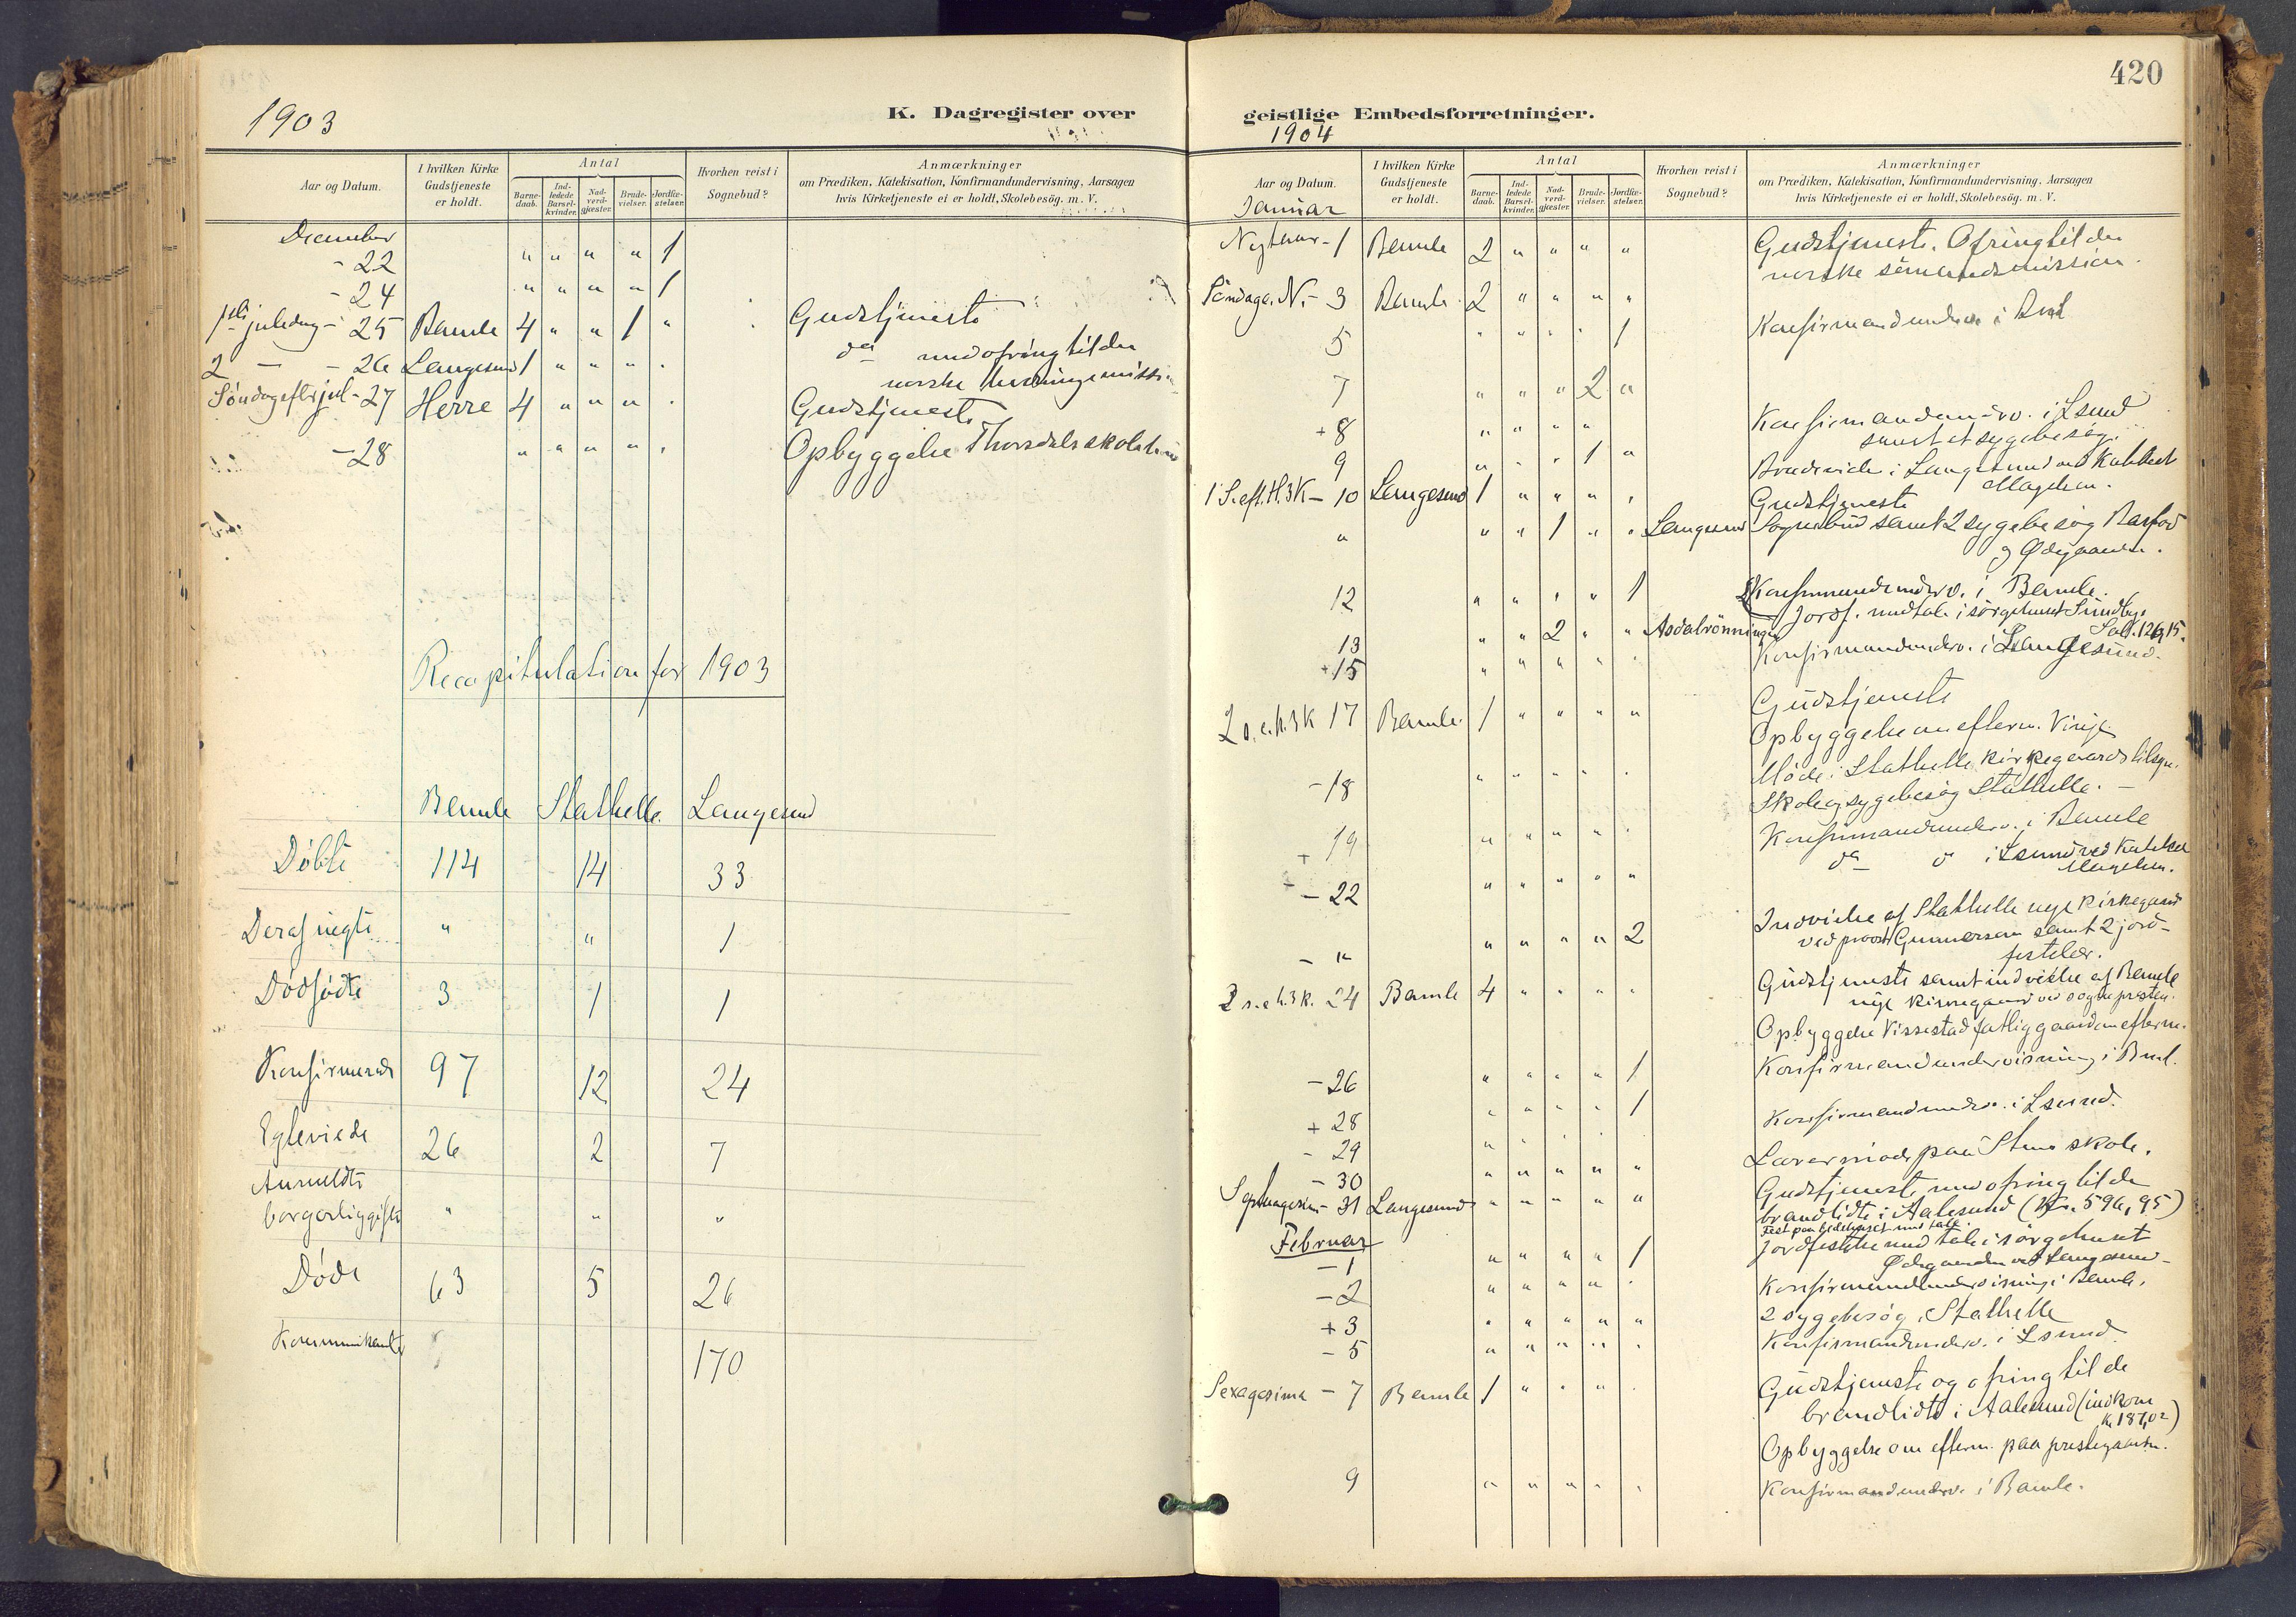 SAKO, Bamble kirkebøker, F/Fa/L0009: Ministerialbok nr. I 9, 1901-1917, s. 420